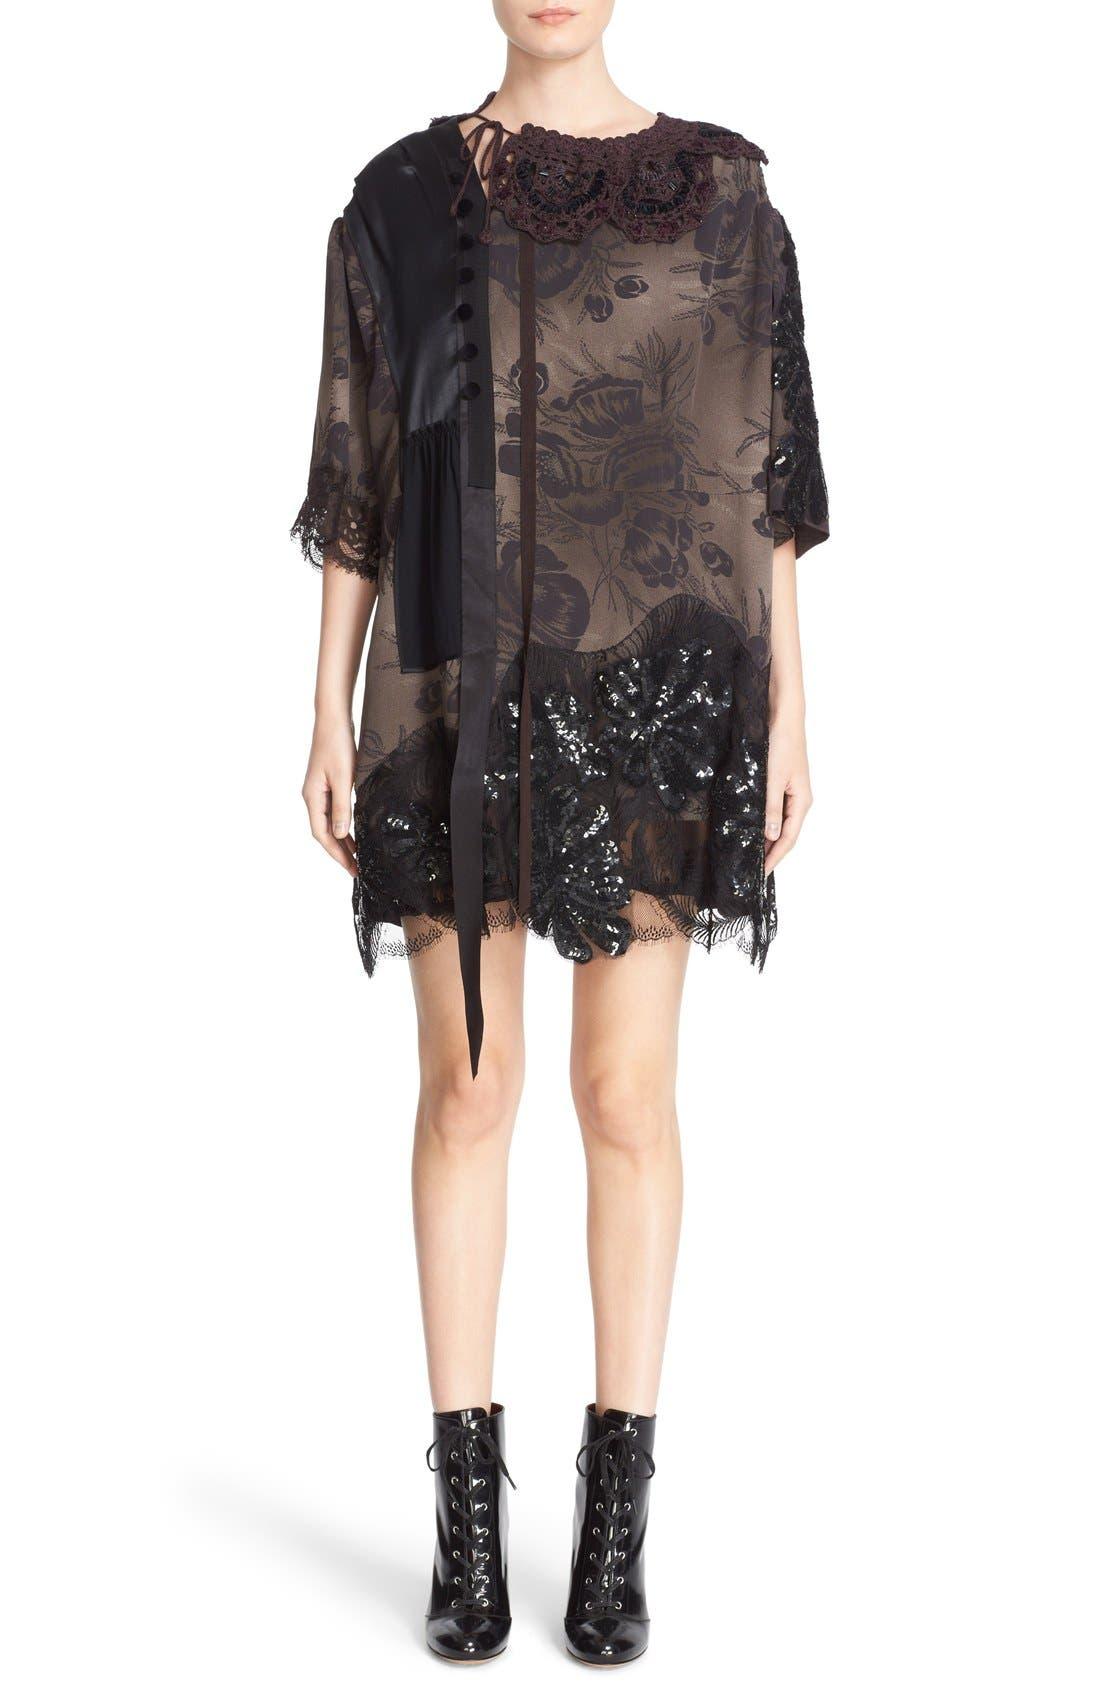 Alternate Image 1 Selected - MARC JACOBS 'Shadow Tulip' Embellished Shift Dress